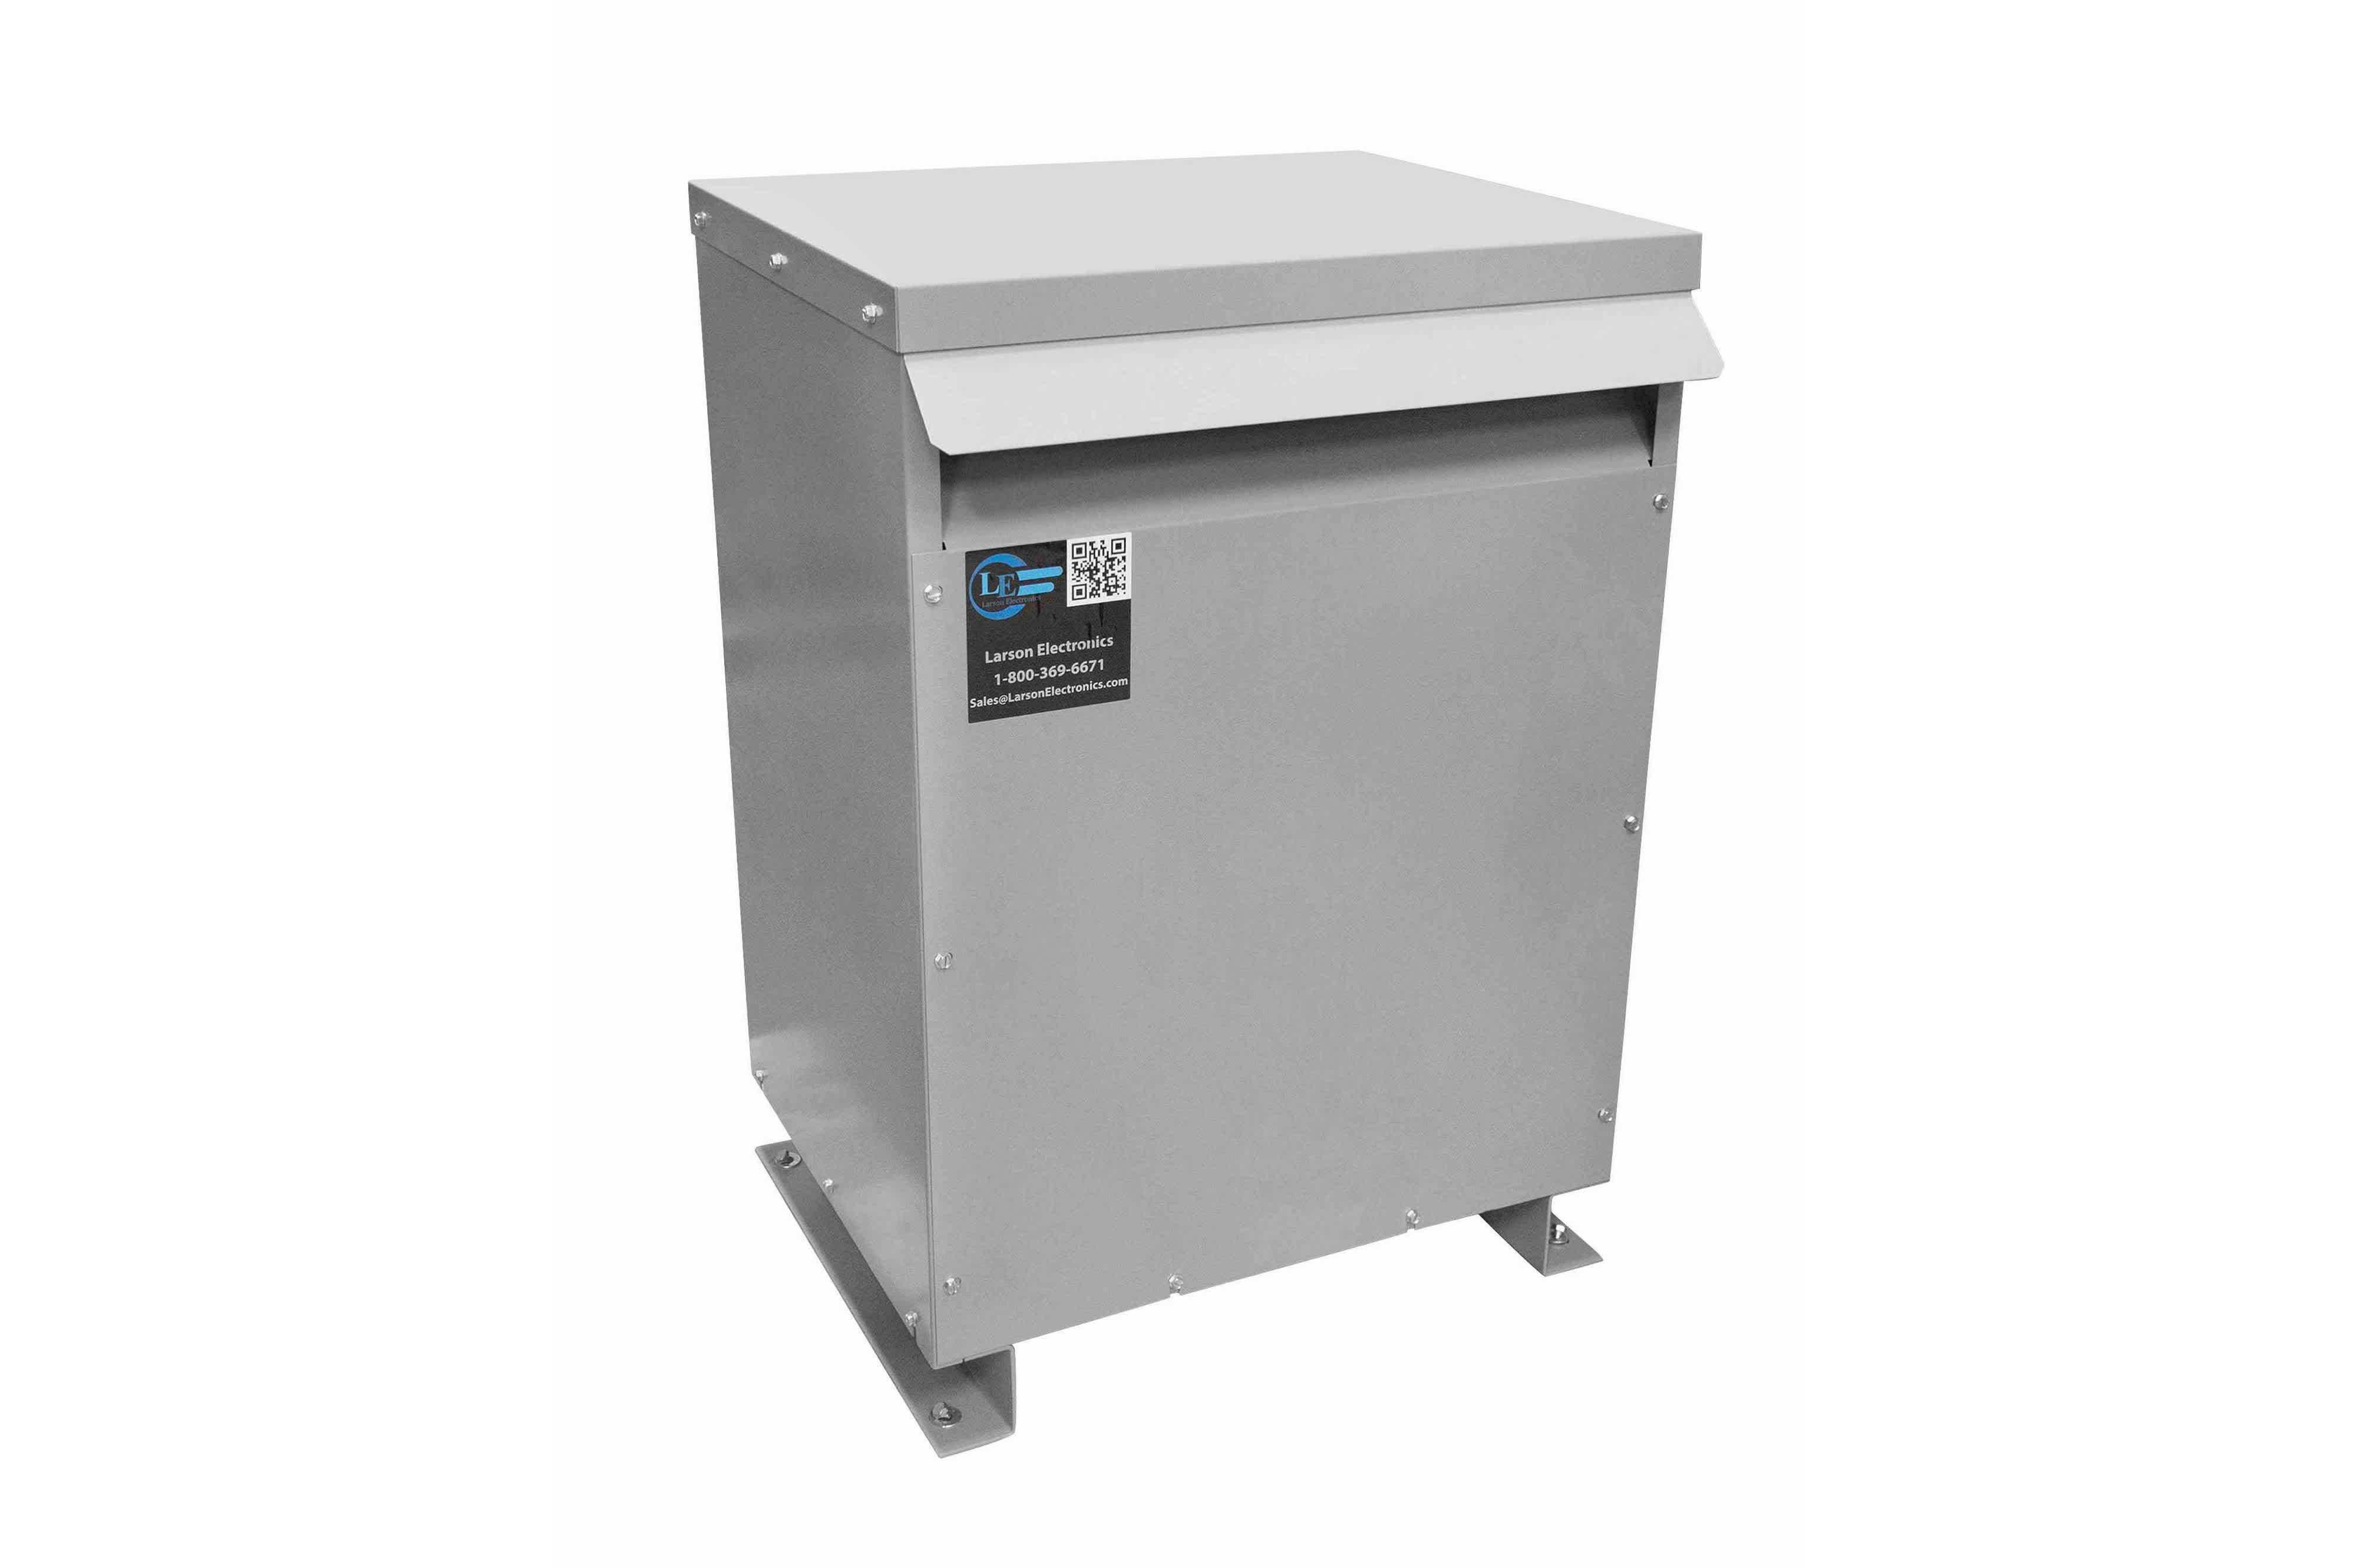 35 kVA 3PH Isolation Transformer, 575V Wye Primary, 208V Delta Secondary, N3R, Ventilated, 60 Hz